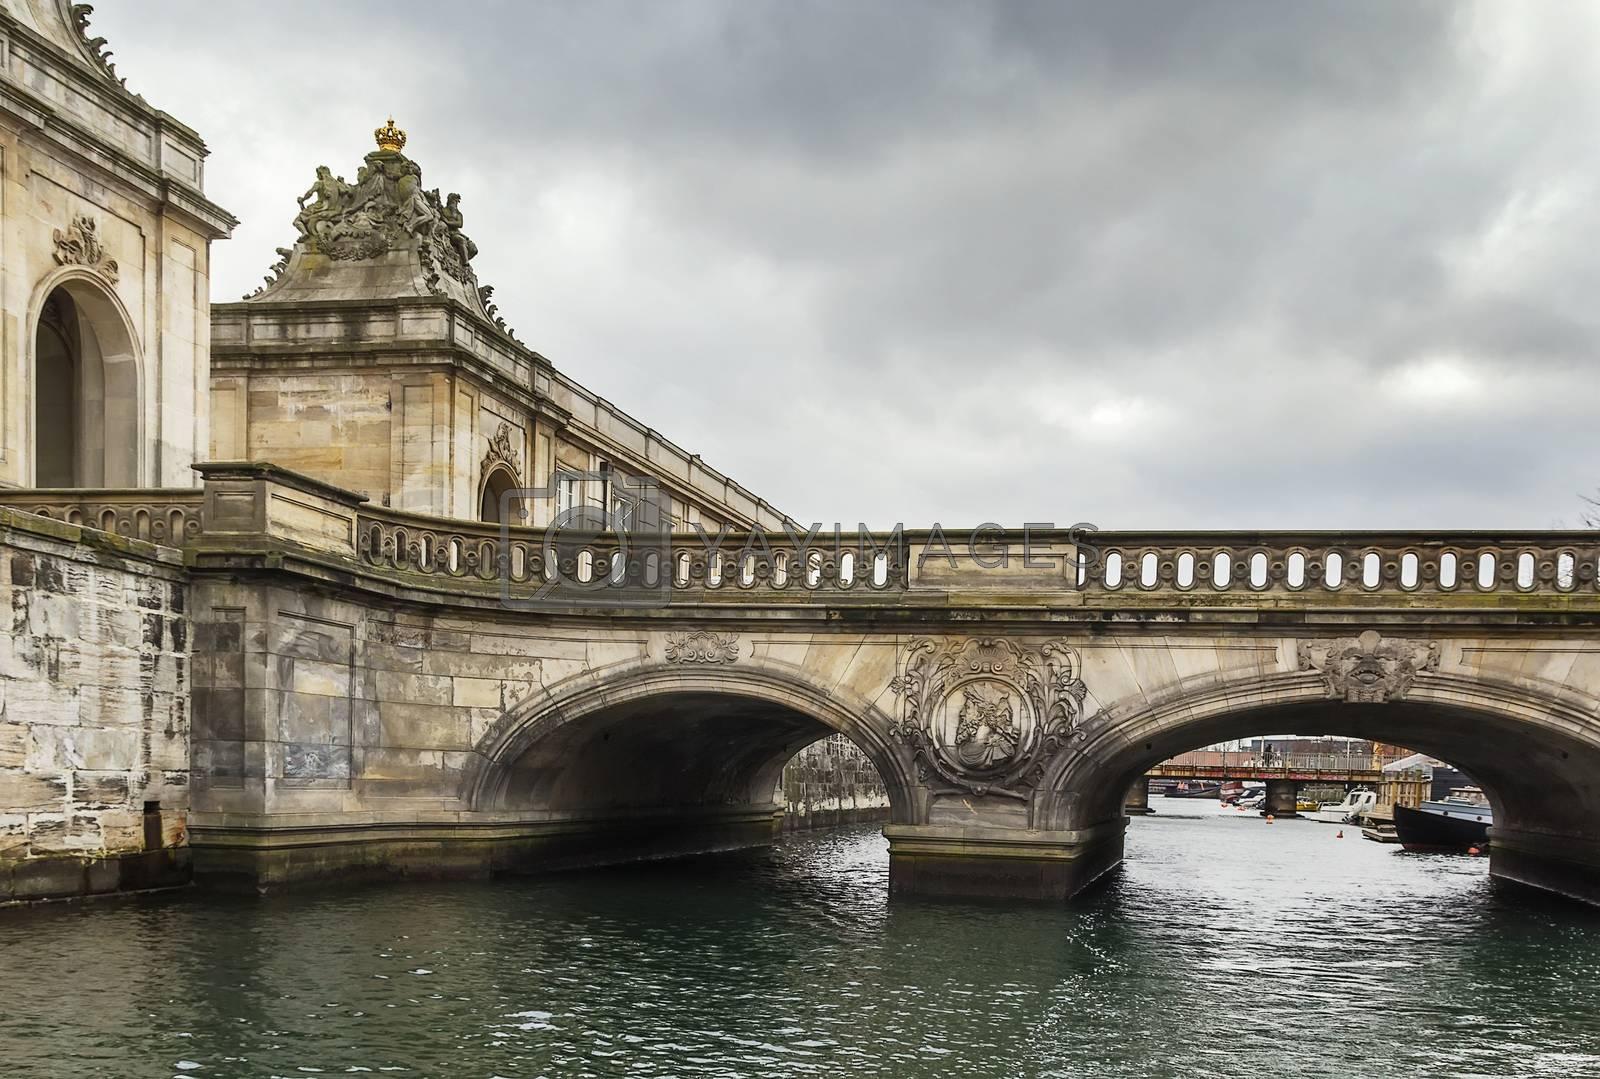 The Marble Bridge, Copenhagen by borisb17